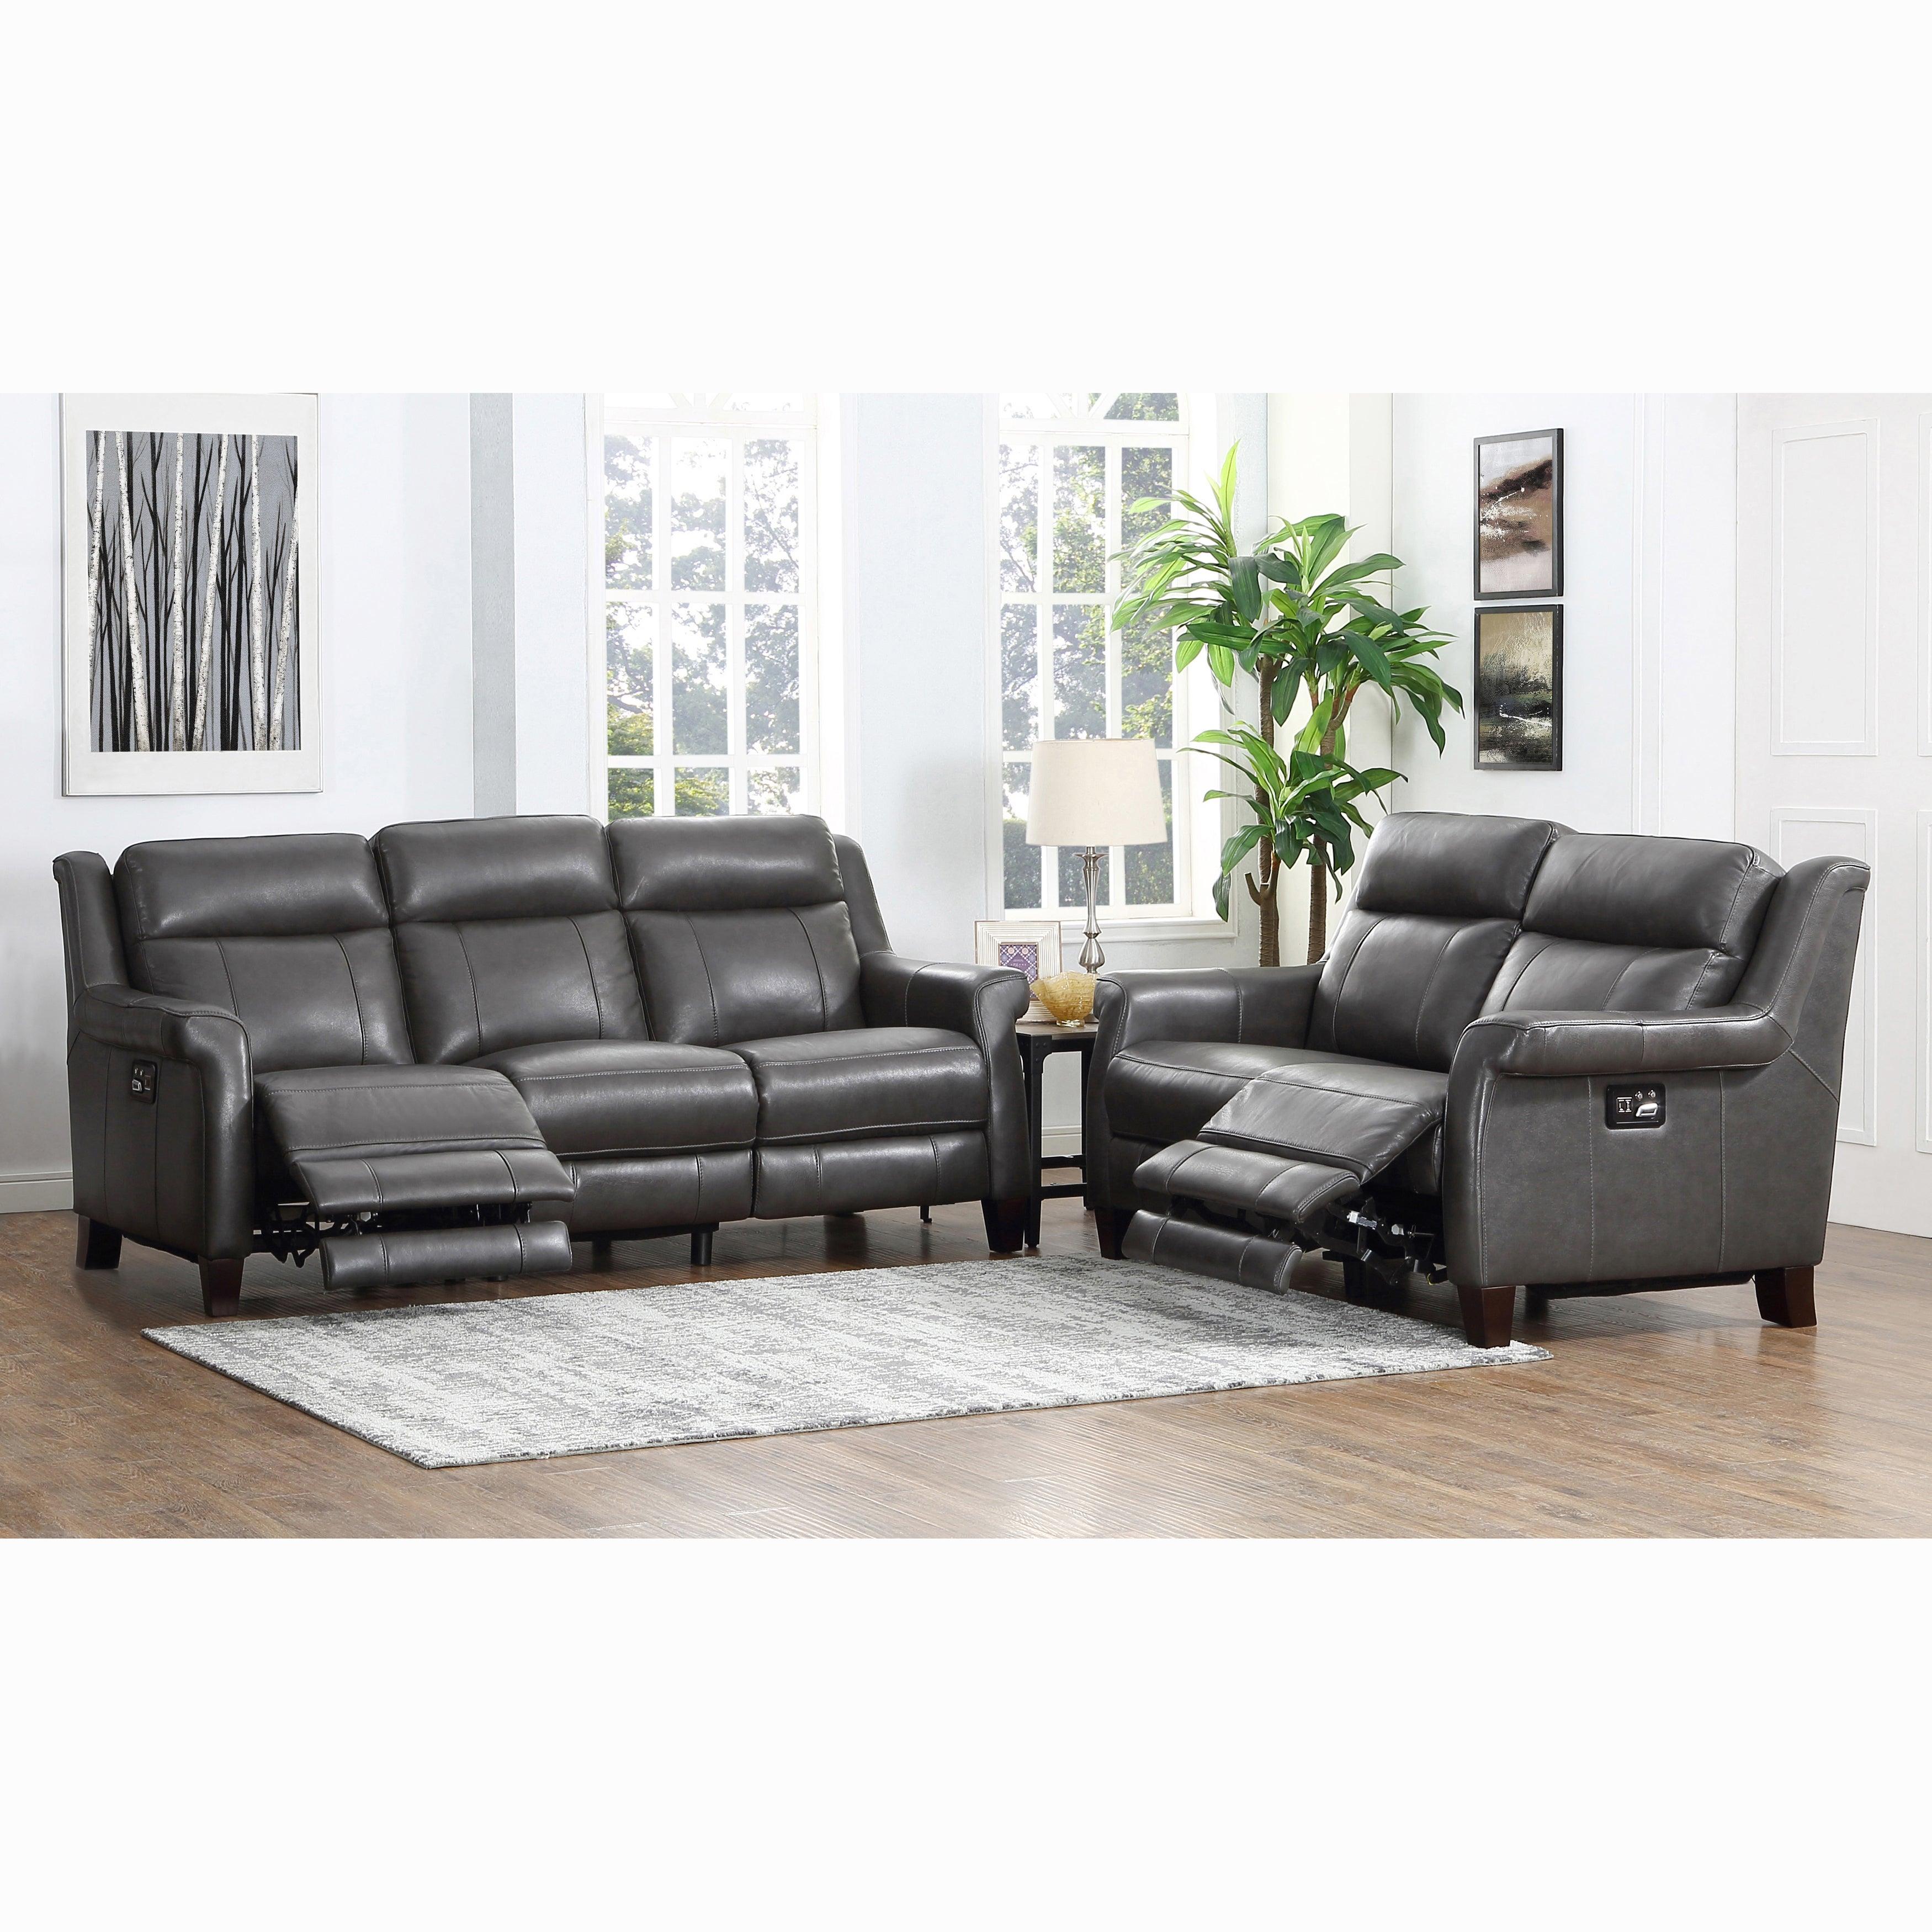 Alex Grey Premium Top Grain Leather Power Reclining Sofa and Loveseat - 86  x 39 x 40